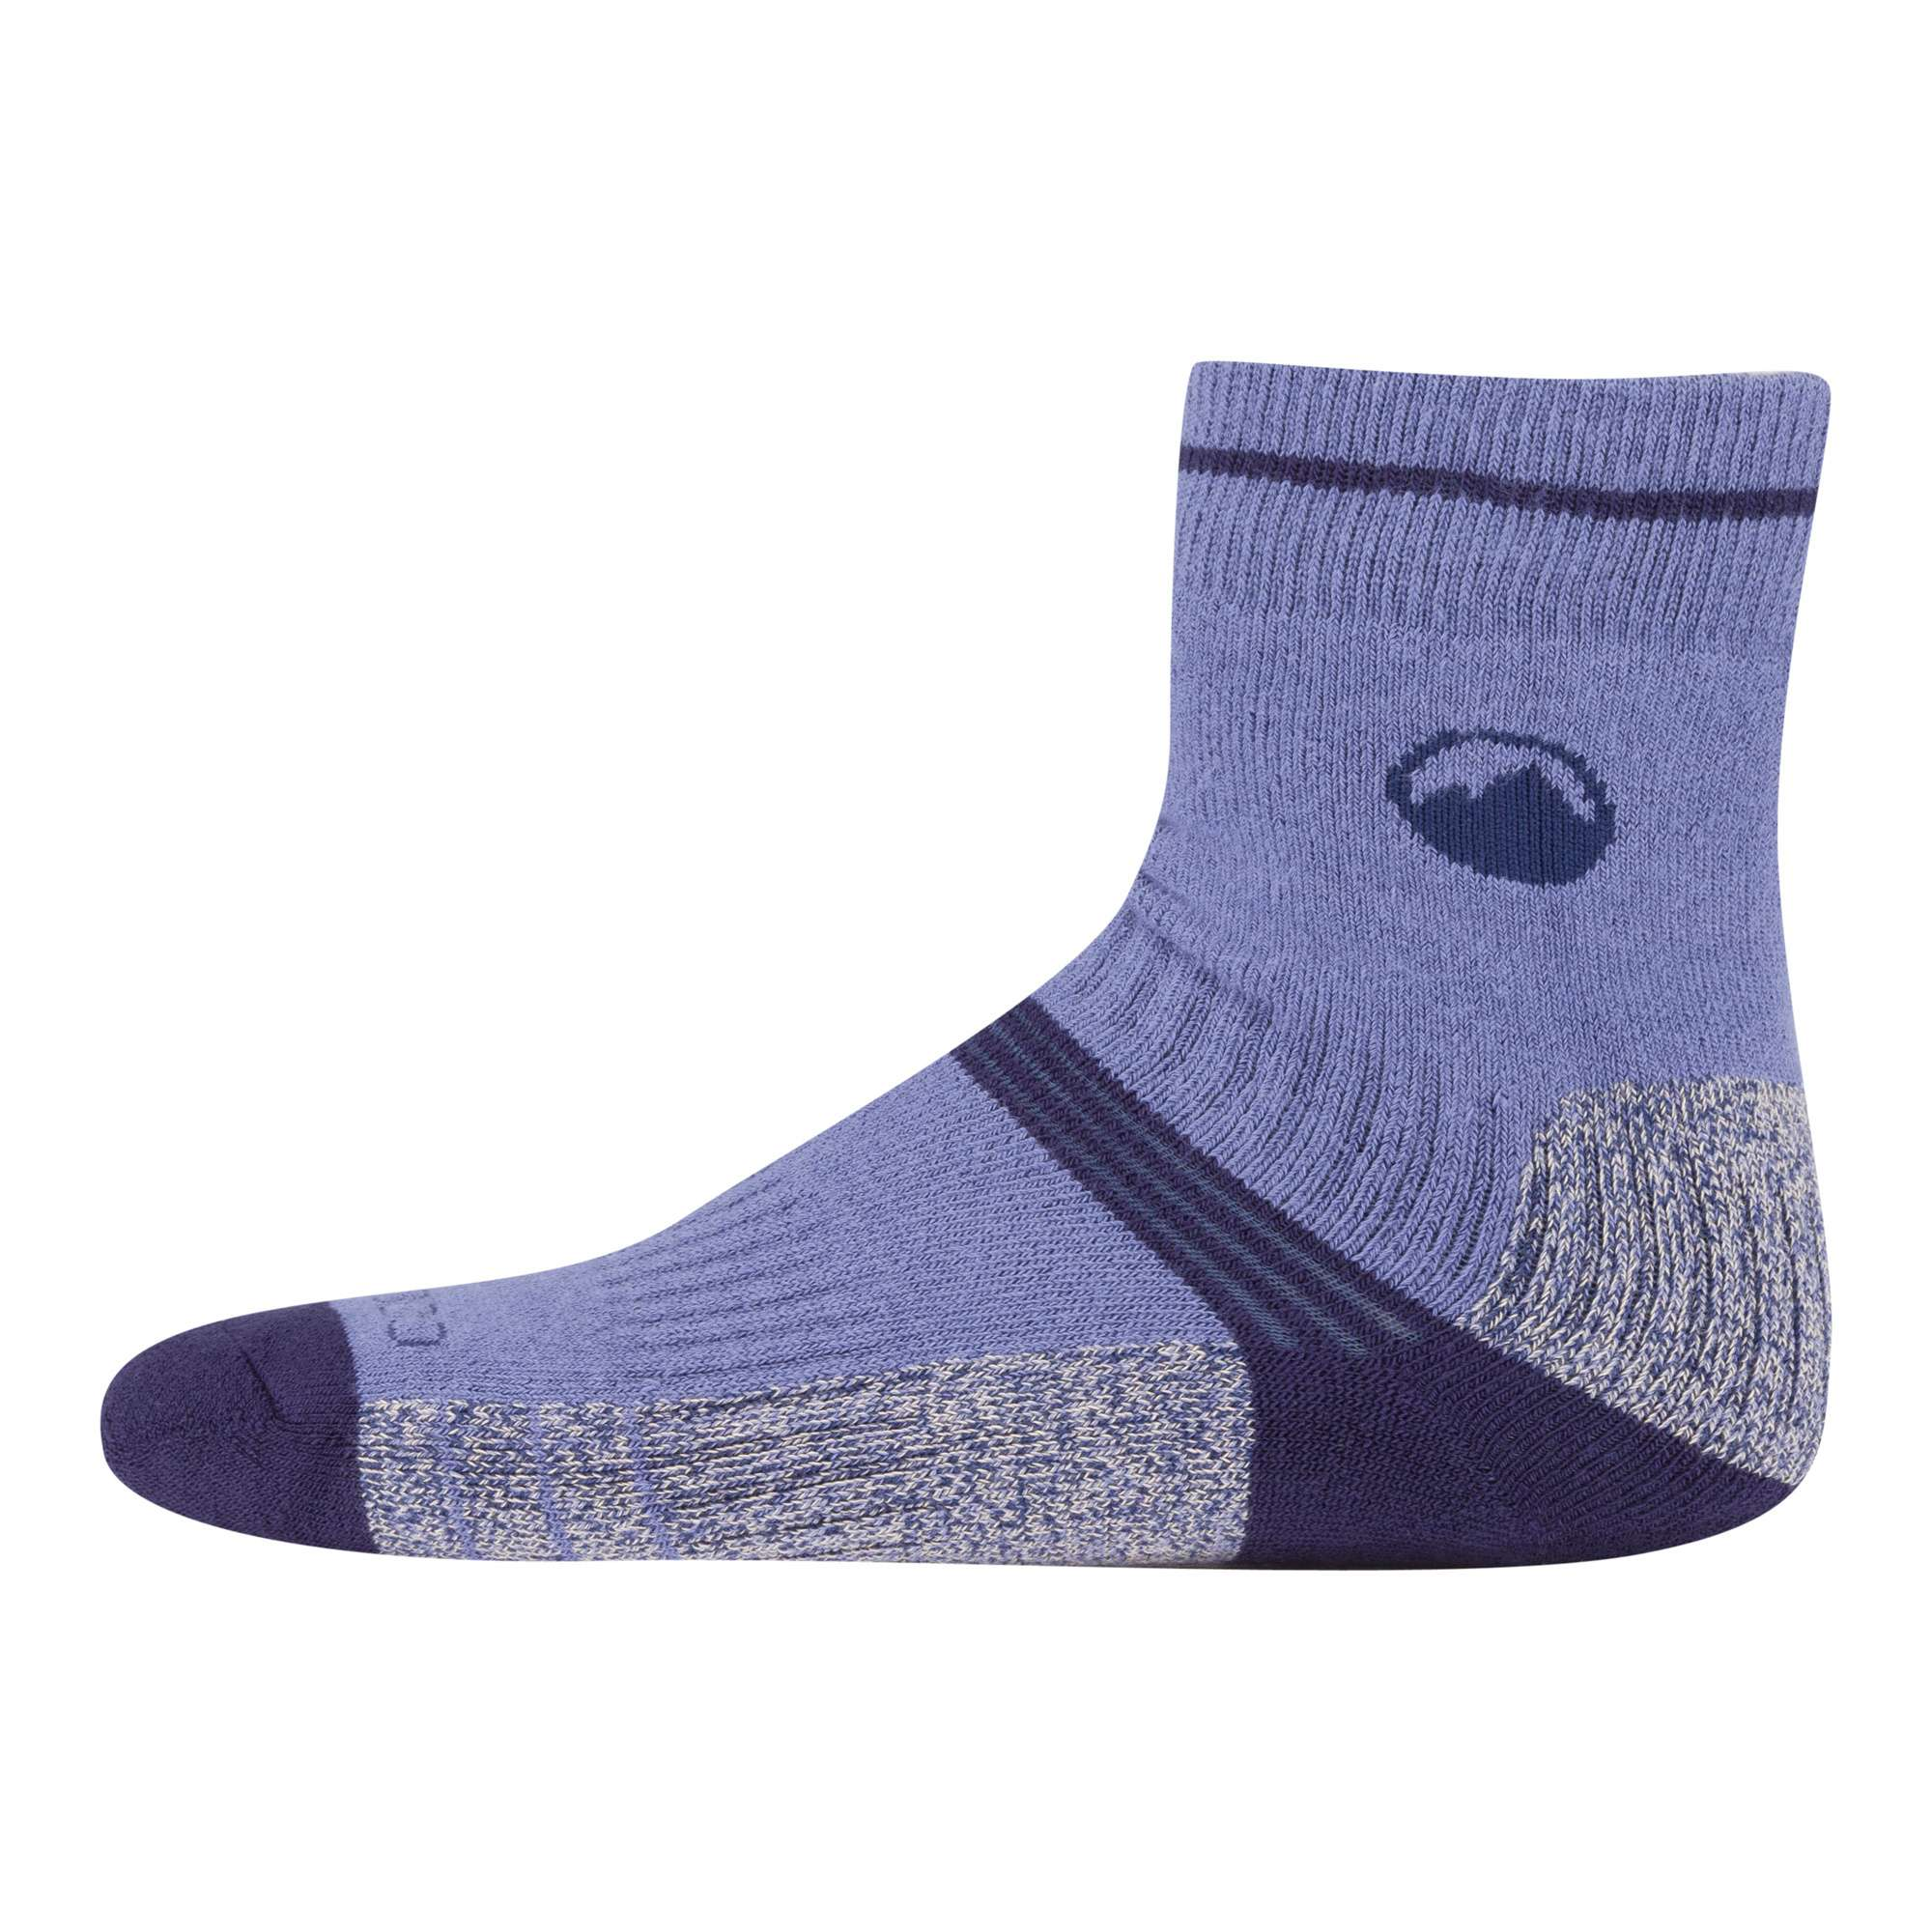 PETER STORM Boy's Heavyweight Ski Socks - 2 Pack